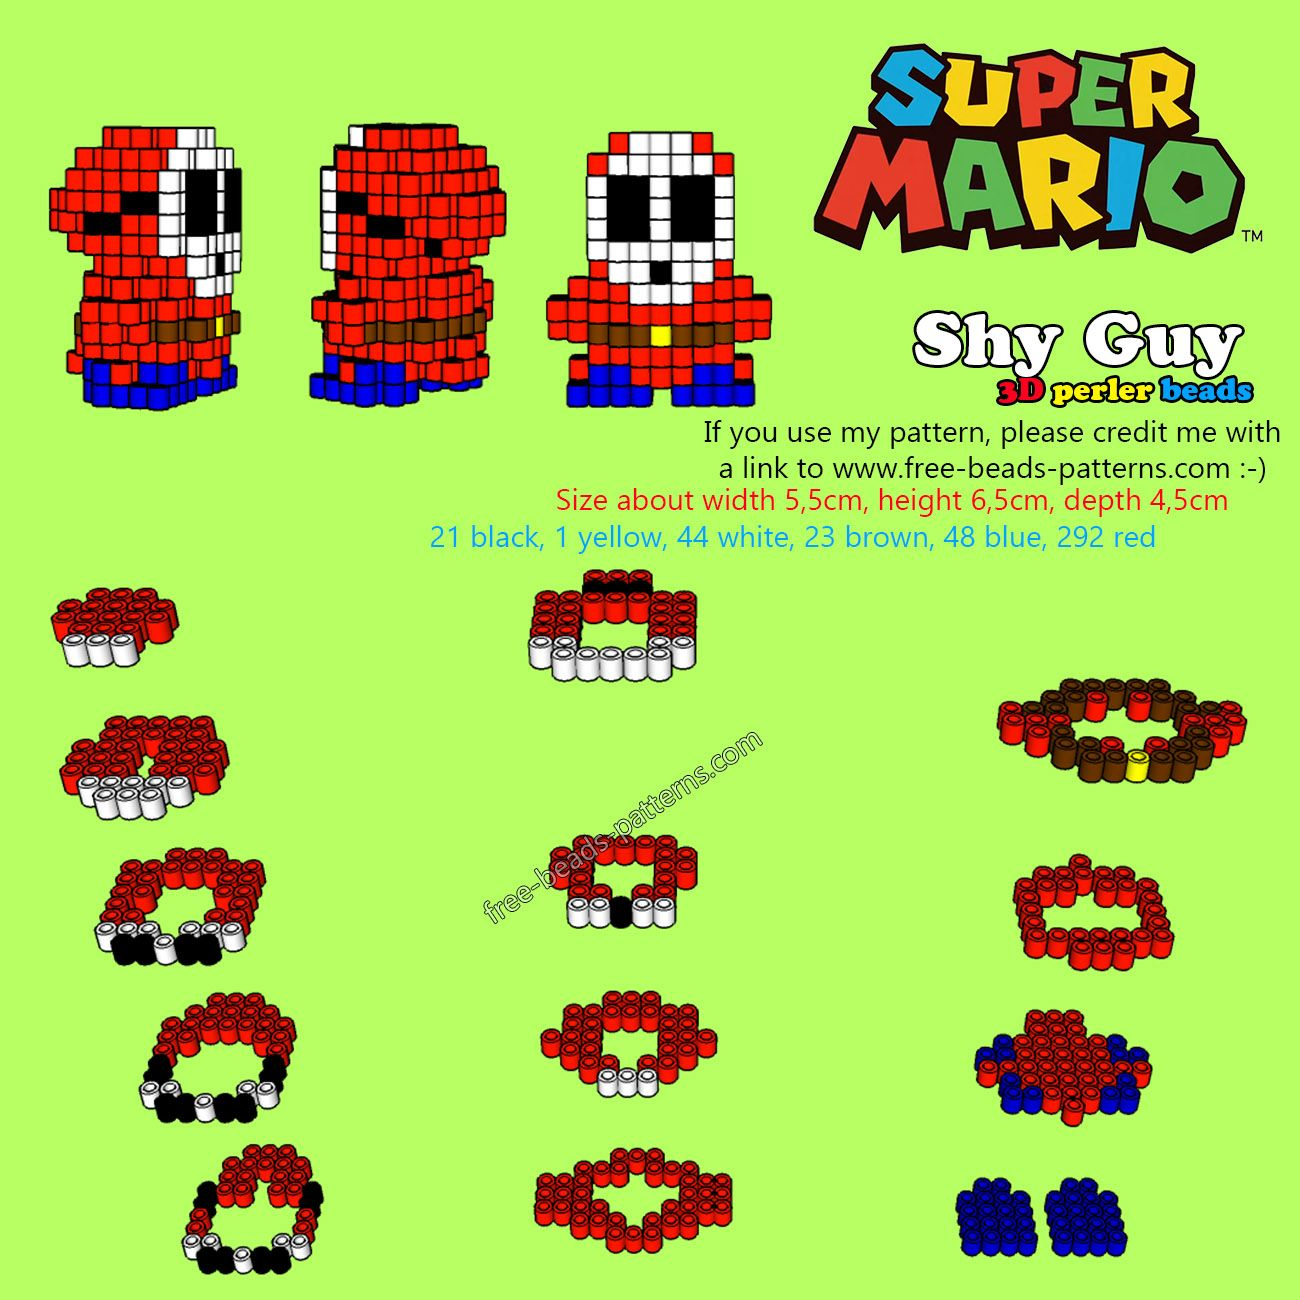 3D perler beads pattern Shy Guy from Super Mario | 3D Perler